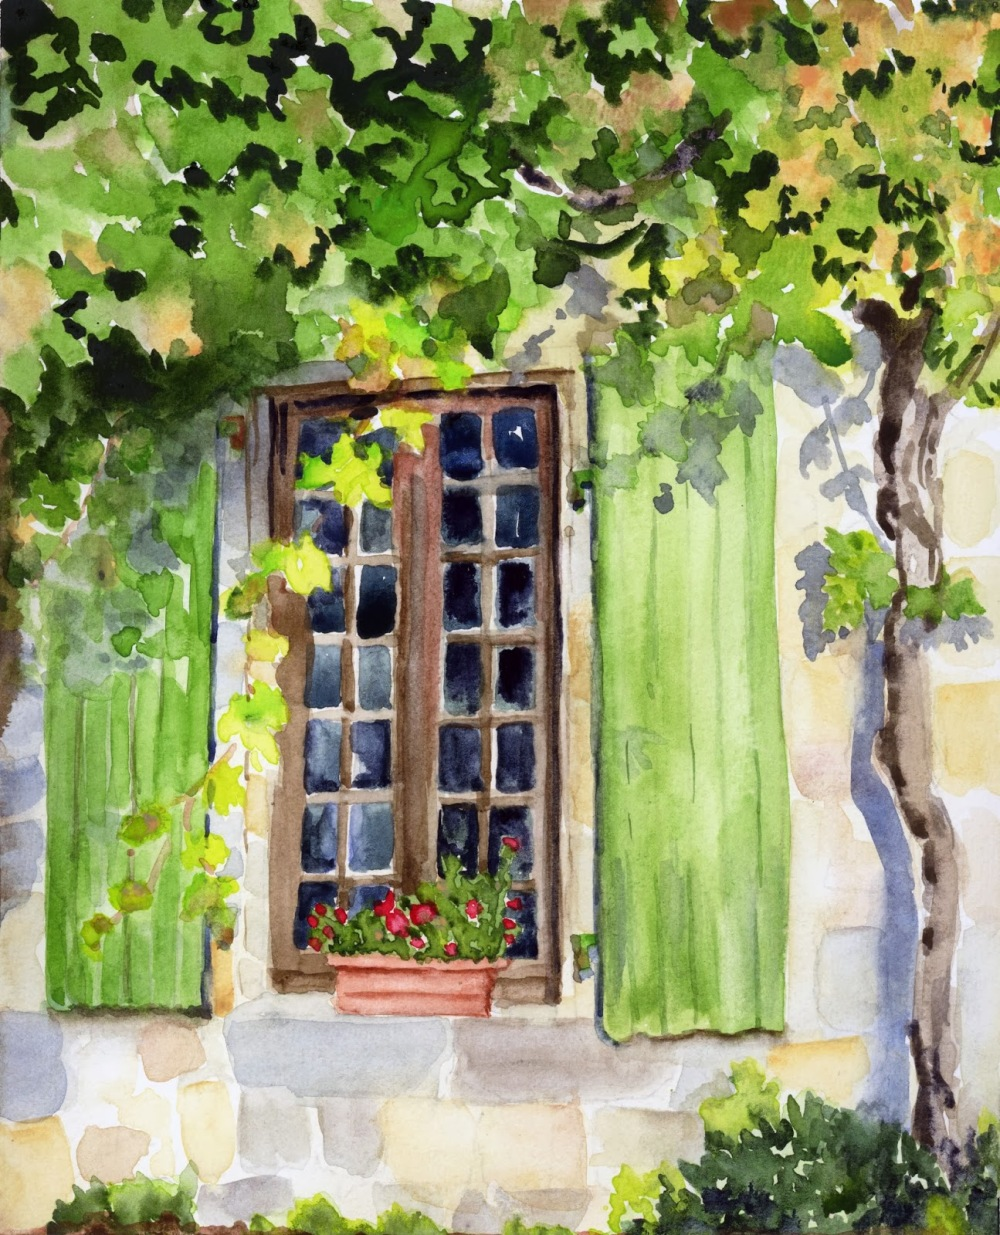 Doodlewash and watercolor sketch by Meliessa Garrison Elliott of Bandouille Window